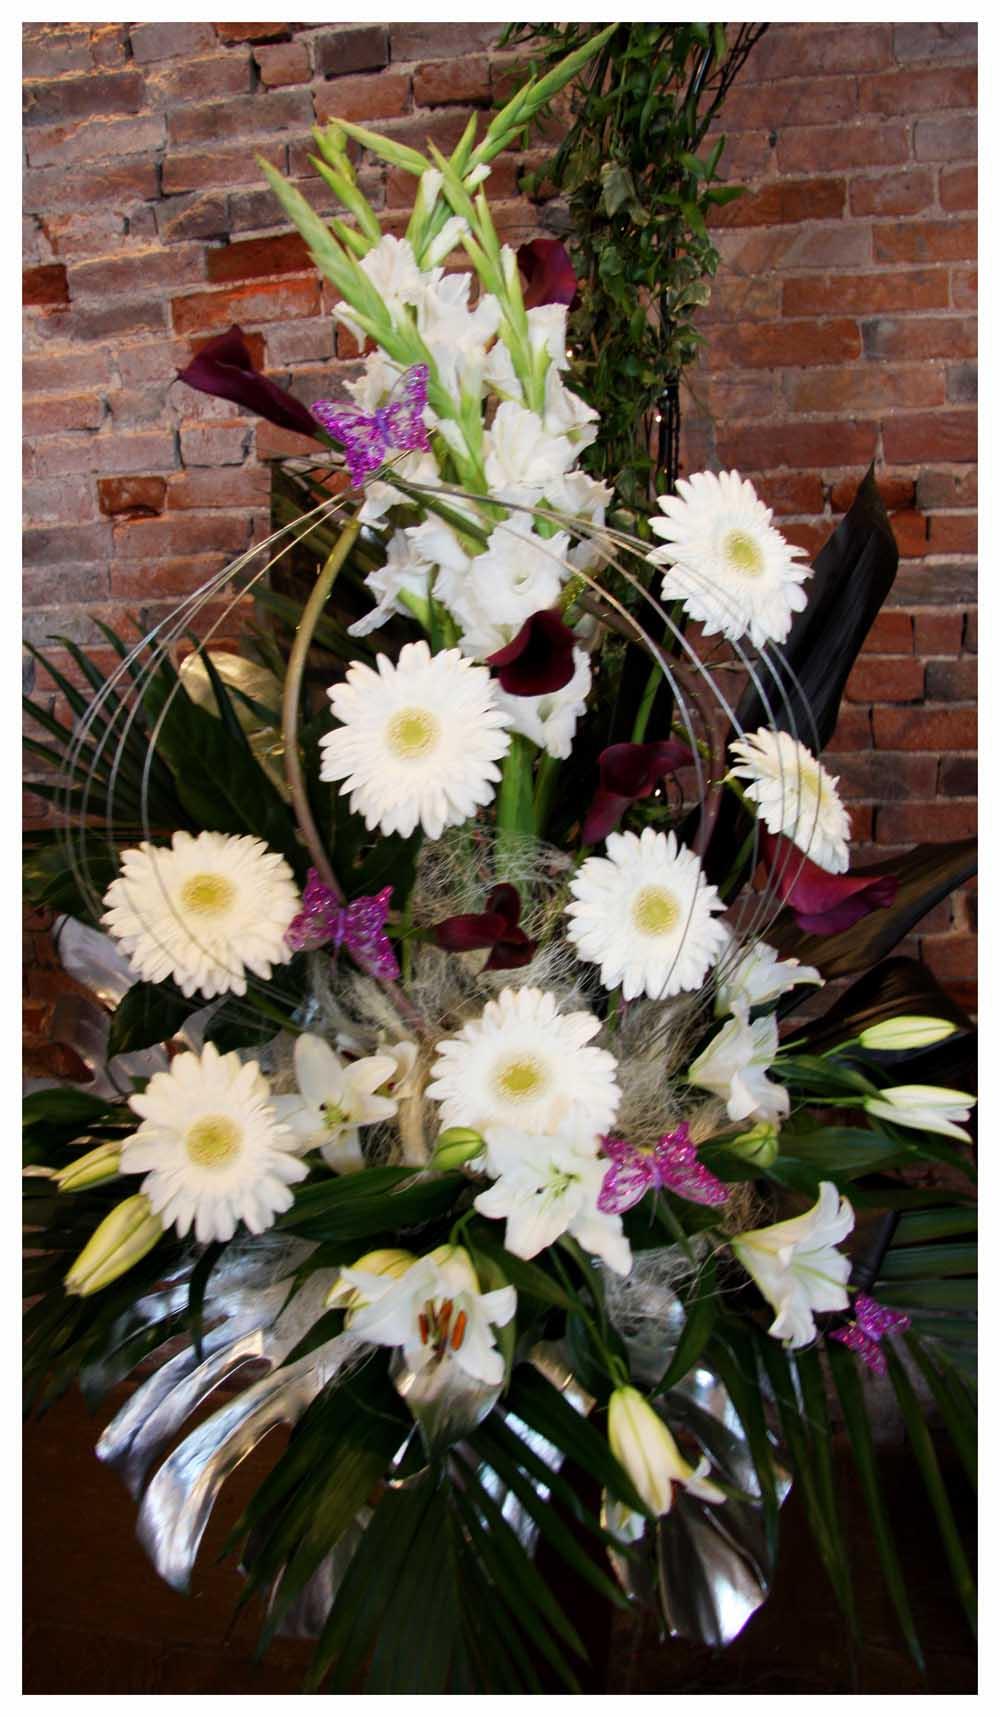 FLOWERS photos by Simeon Thaw copyright 2014 (48).jpg